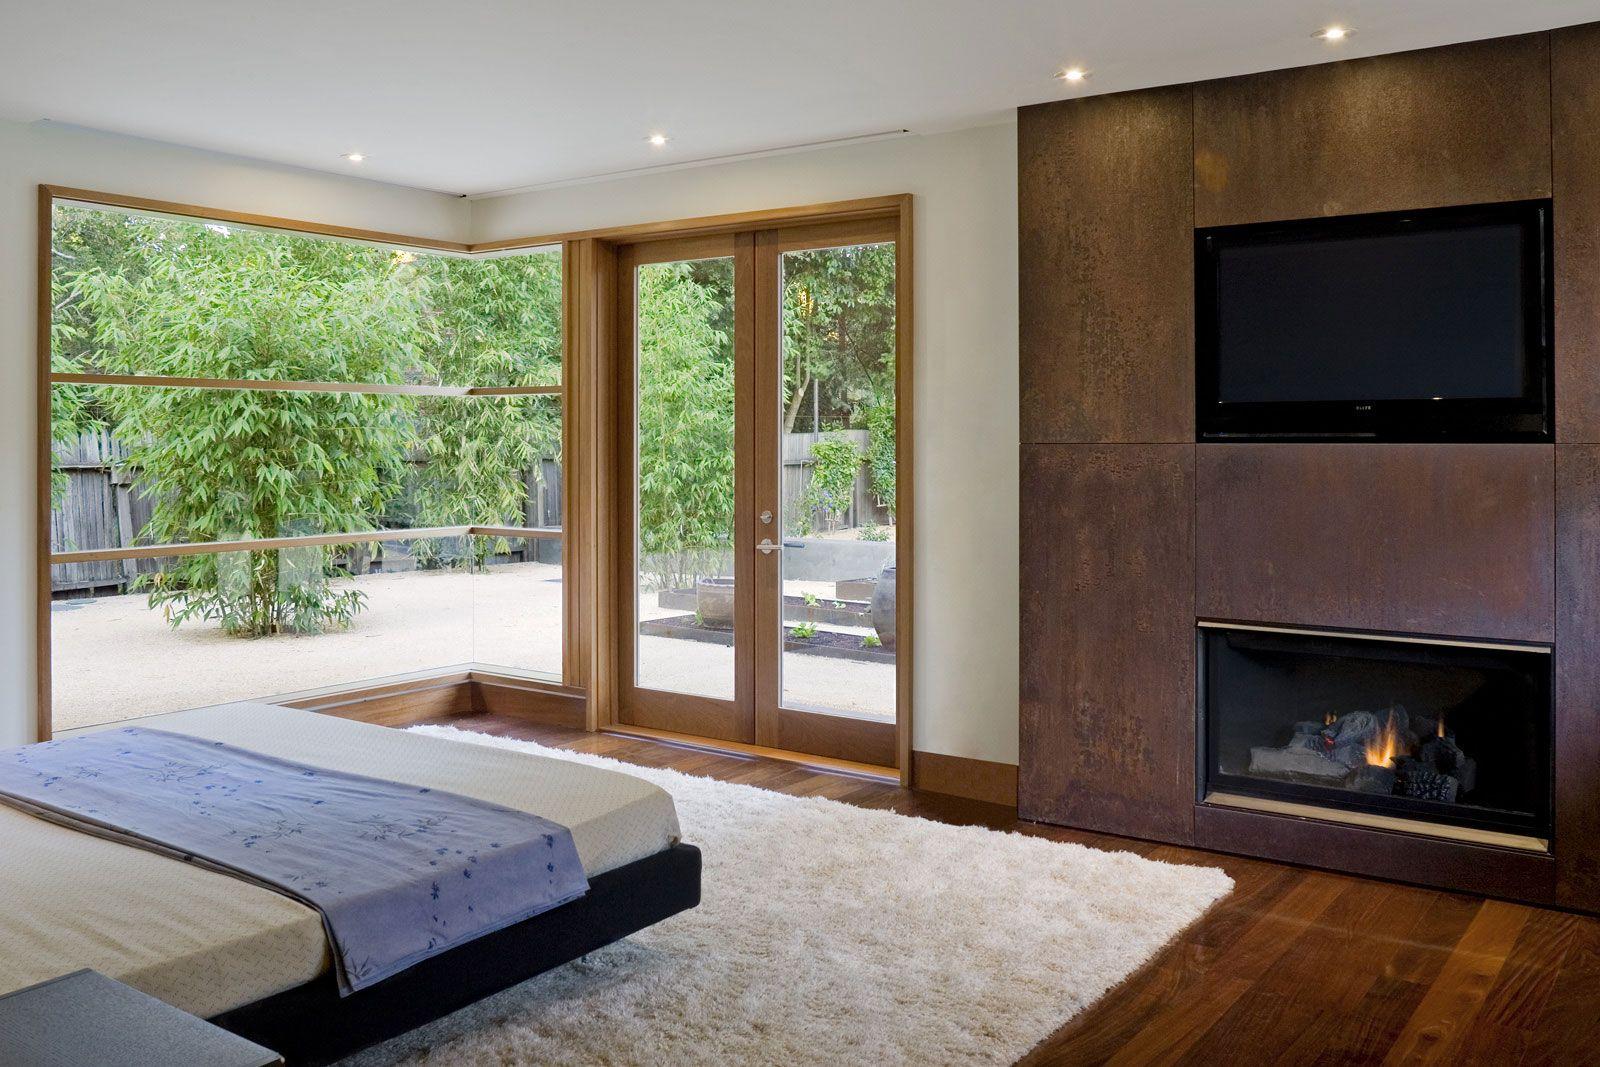 Bedroom Fireplace Design Wheeler Residence Designedwilliam Duff Architects